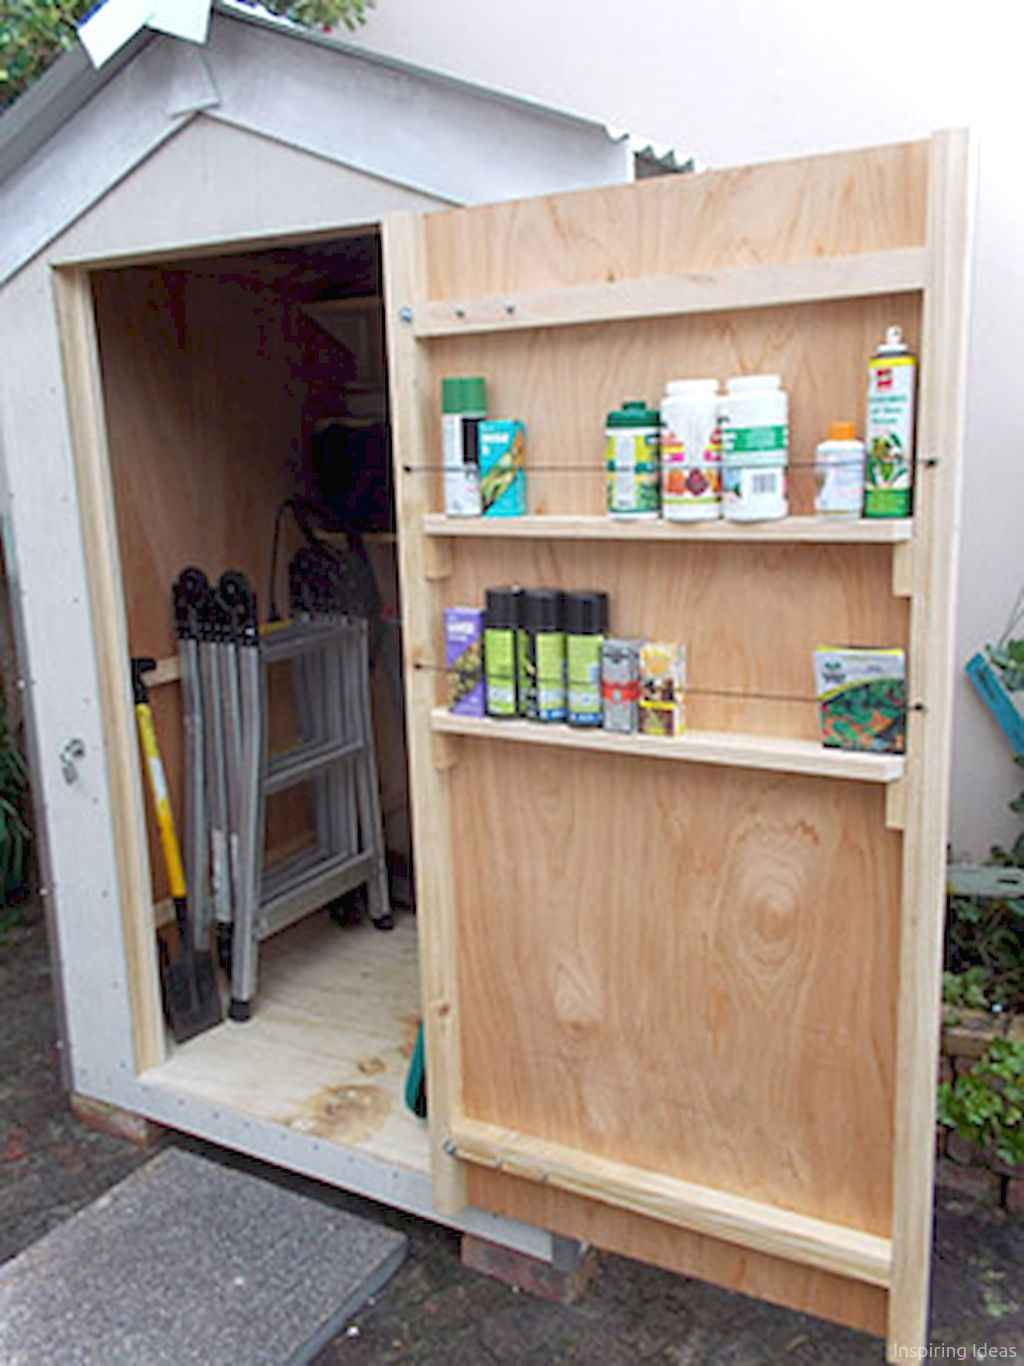 Smart garden shed organization ideas 24 , Room a Holic